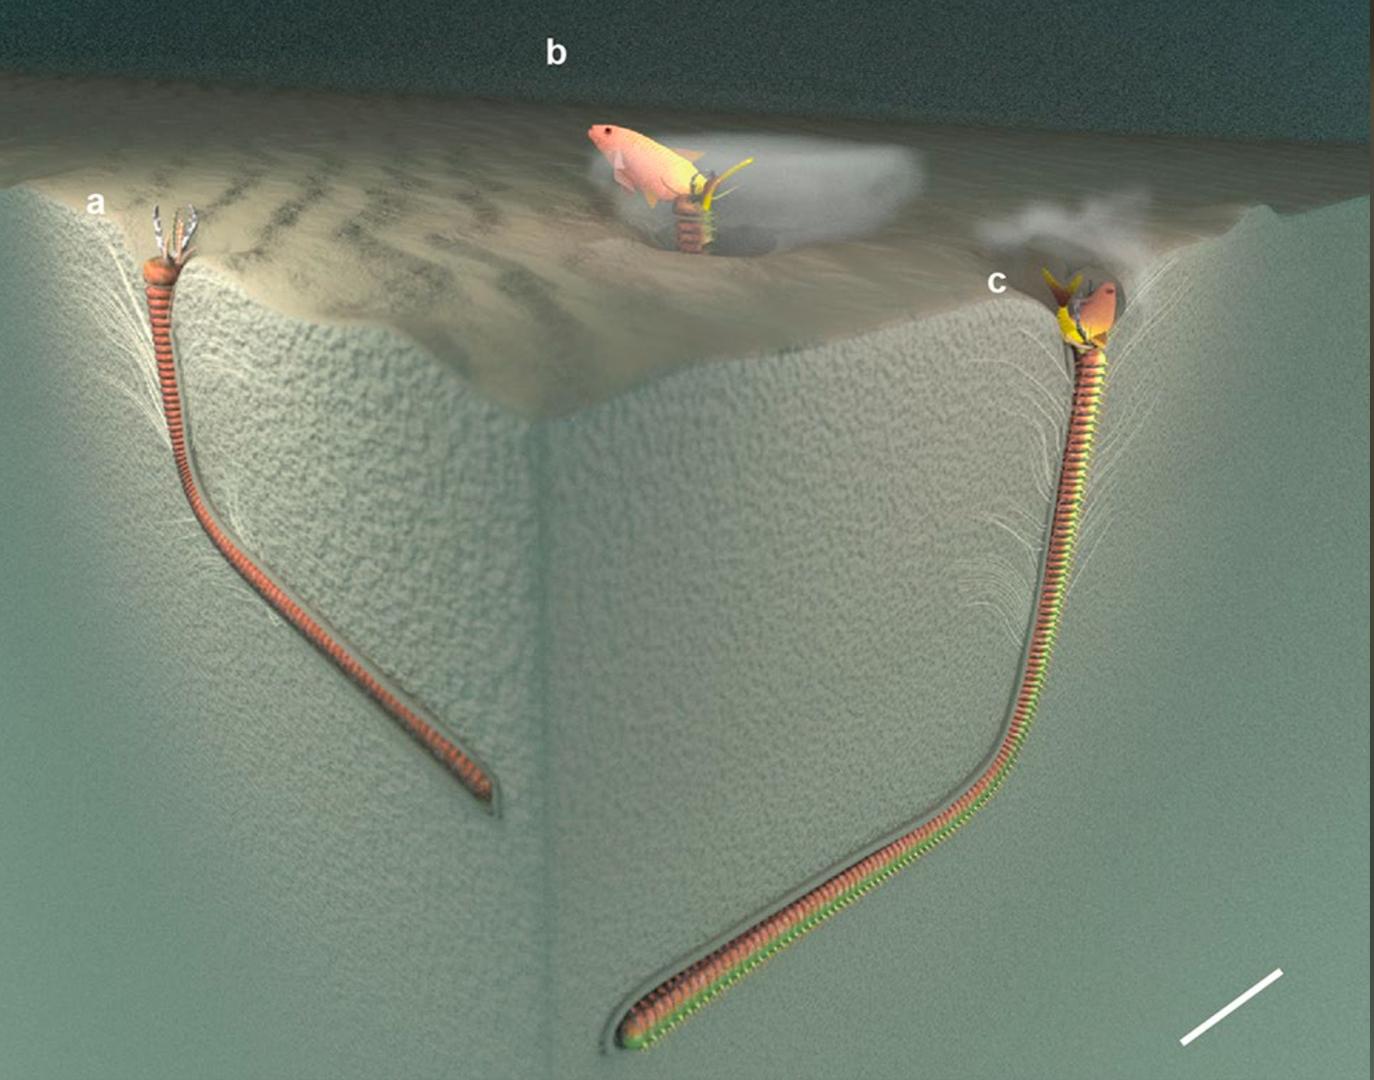 vermes gigantes